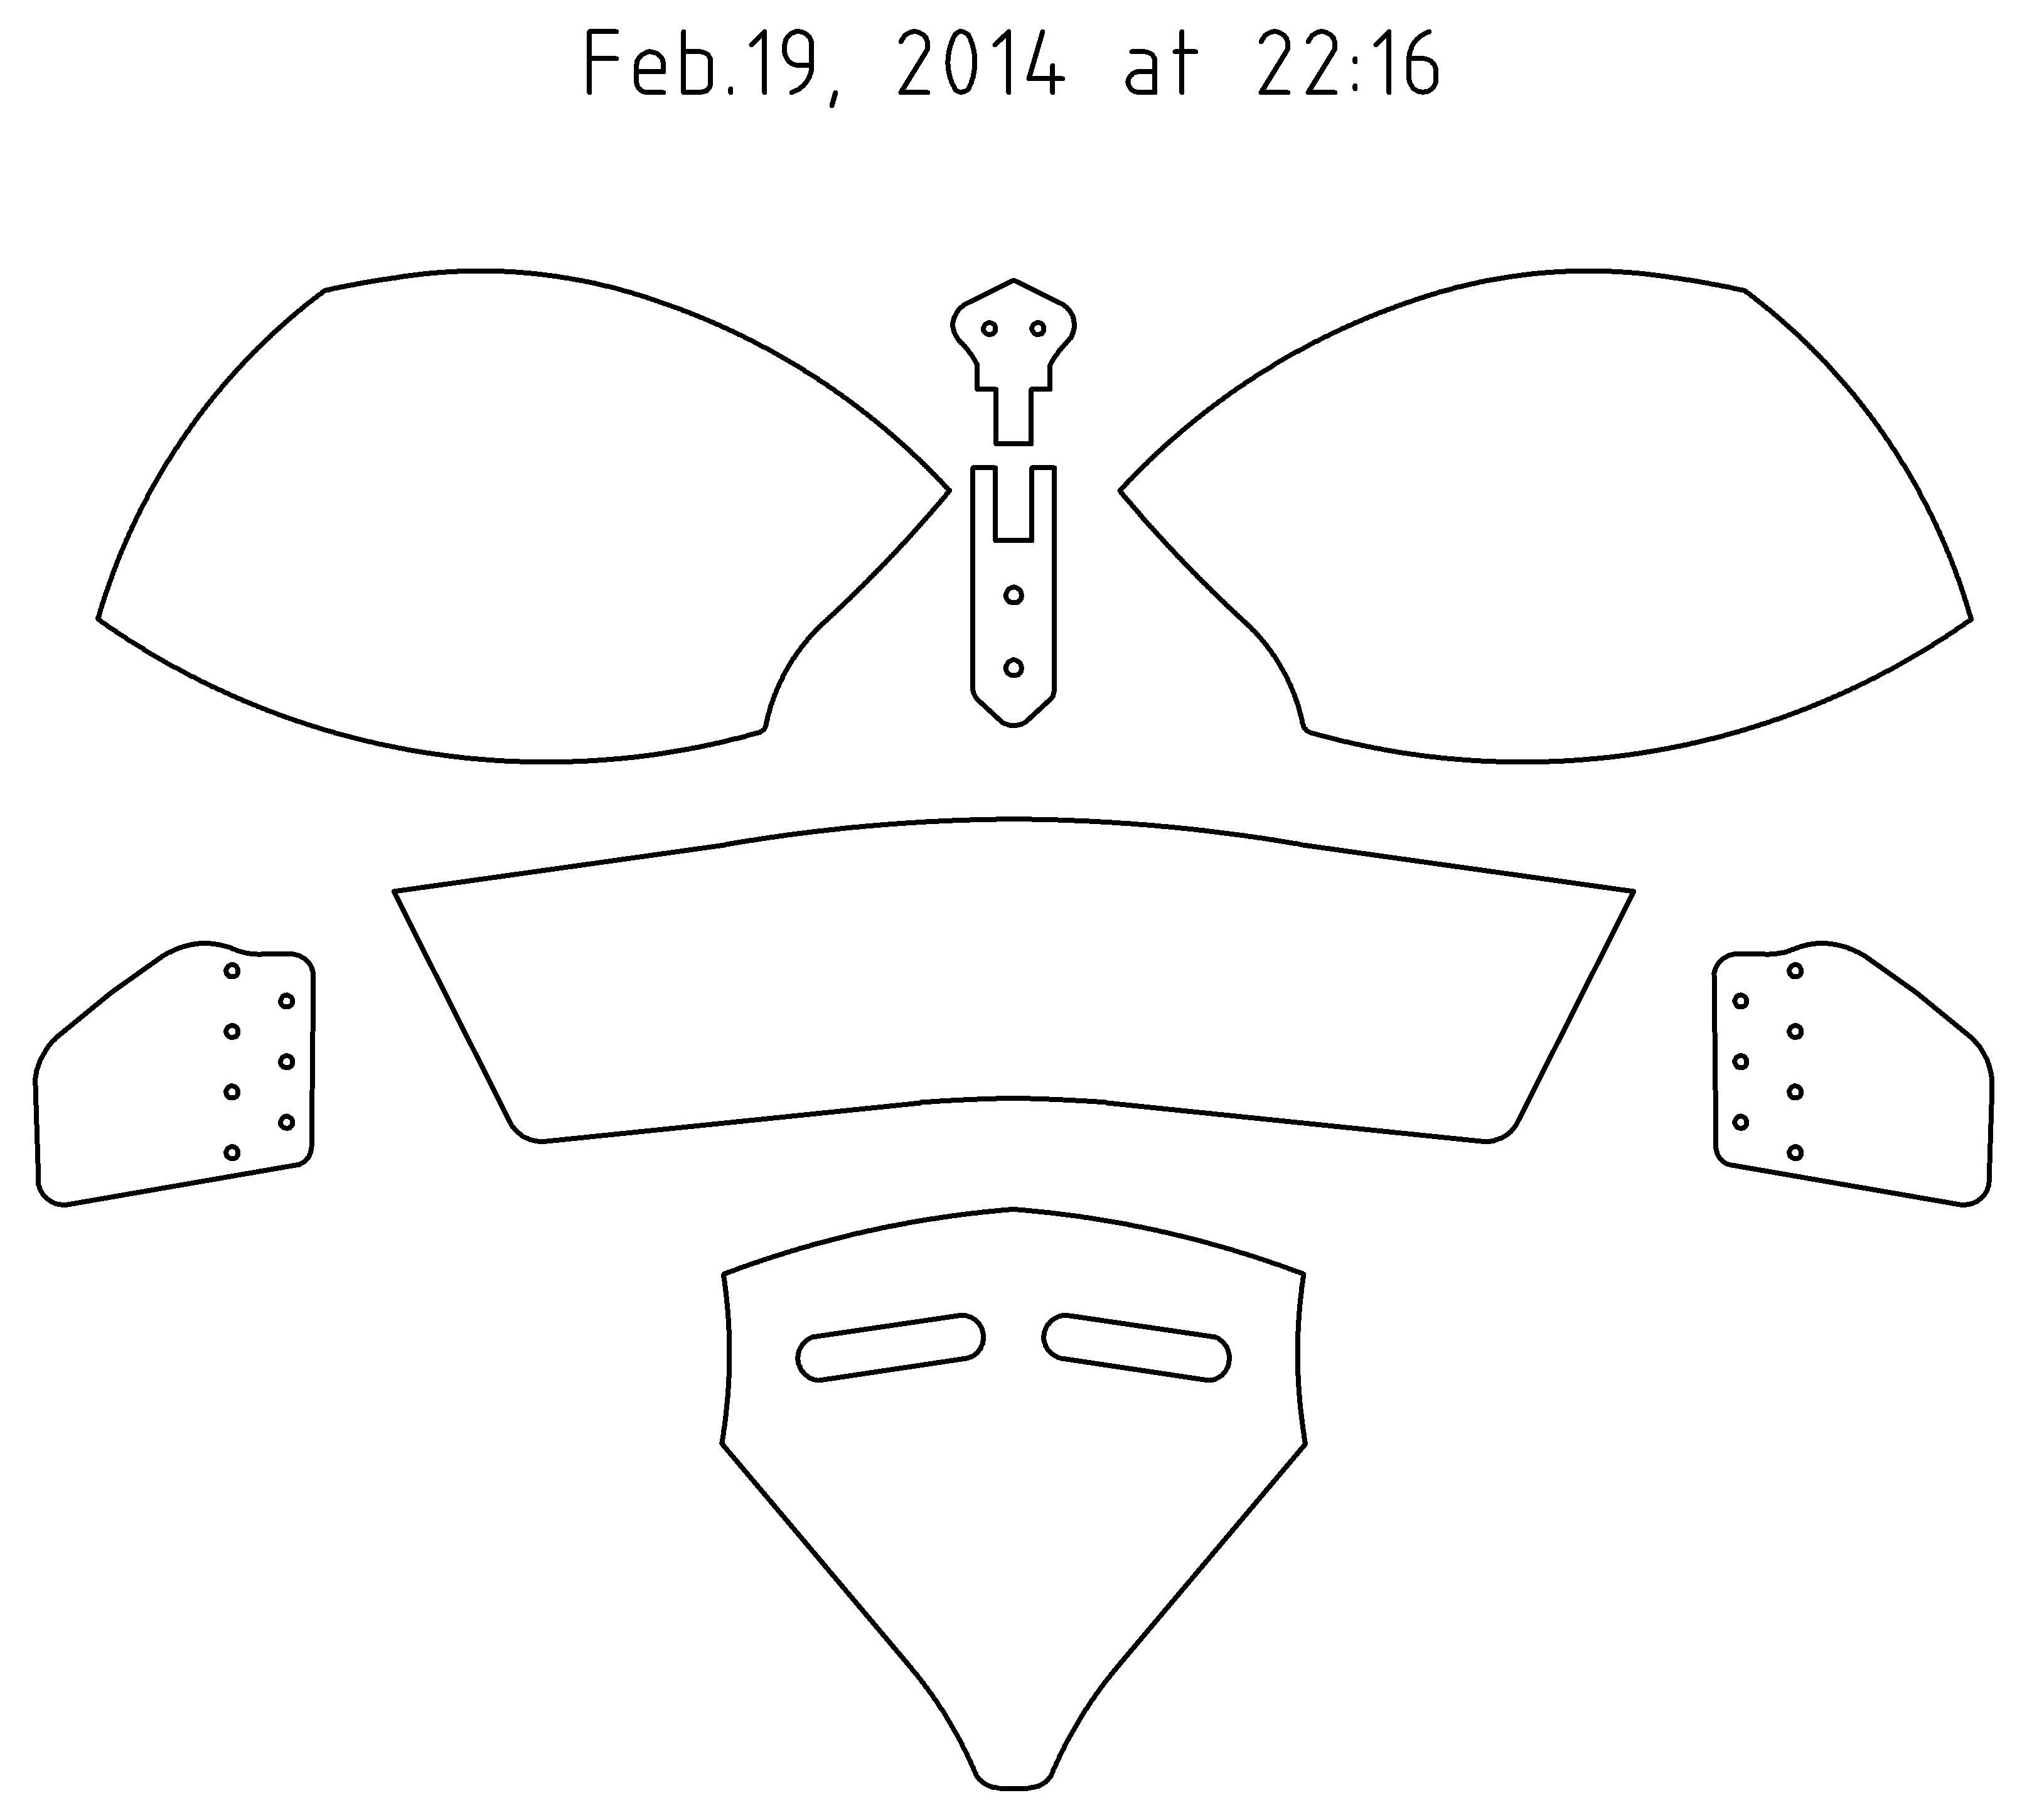 Klappvisorbascinetg 32302900 armor and helmet patterns klappvisorbascinetg 32302900 pronofoot35fo Images